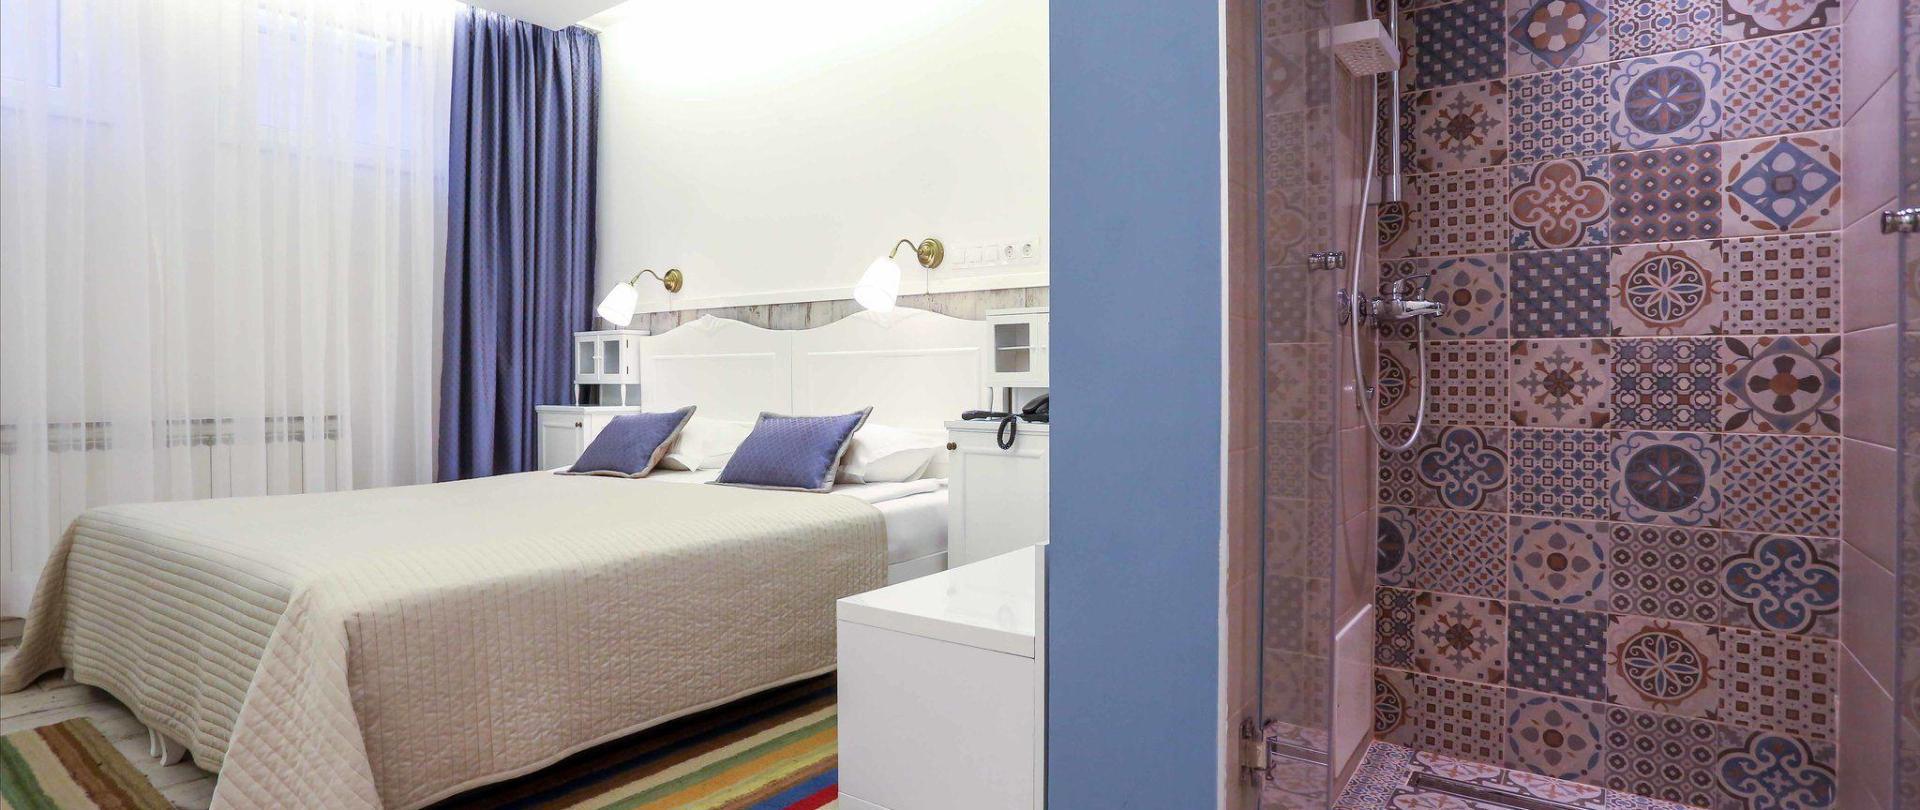 hotel-divan-by-dzenat-drekovic-29-08-2016-16-1.jpg